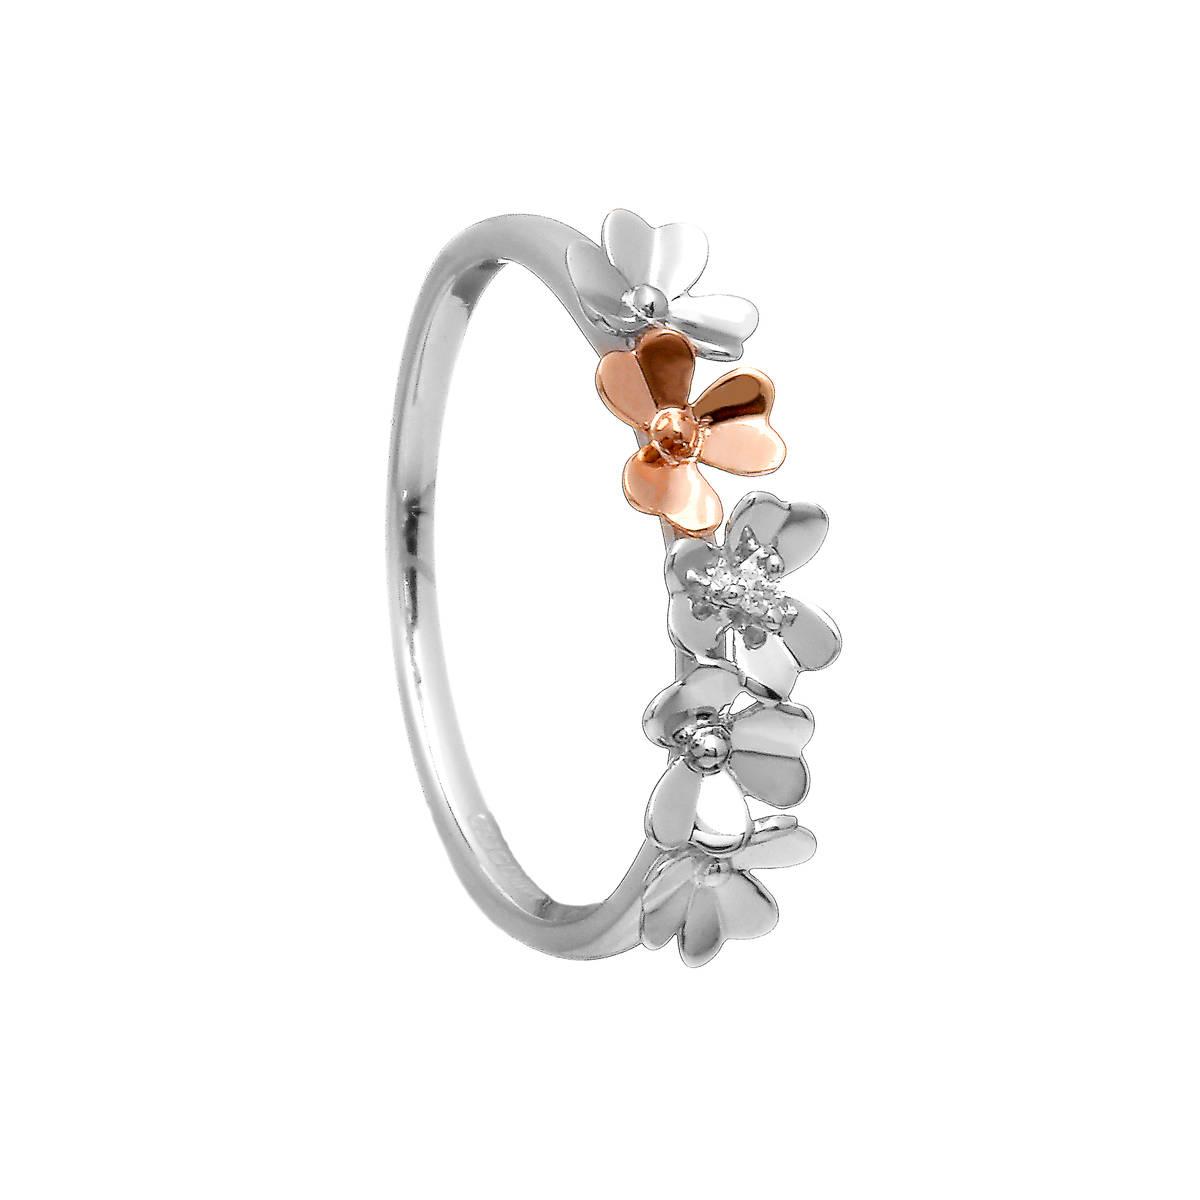 Diamond-set 9 carat white gold love shamrock band ring with one rare Irish rose gold shamrock flower.